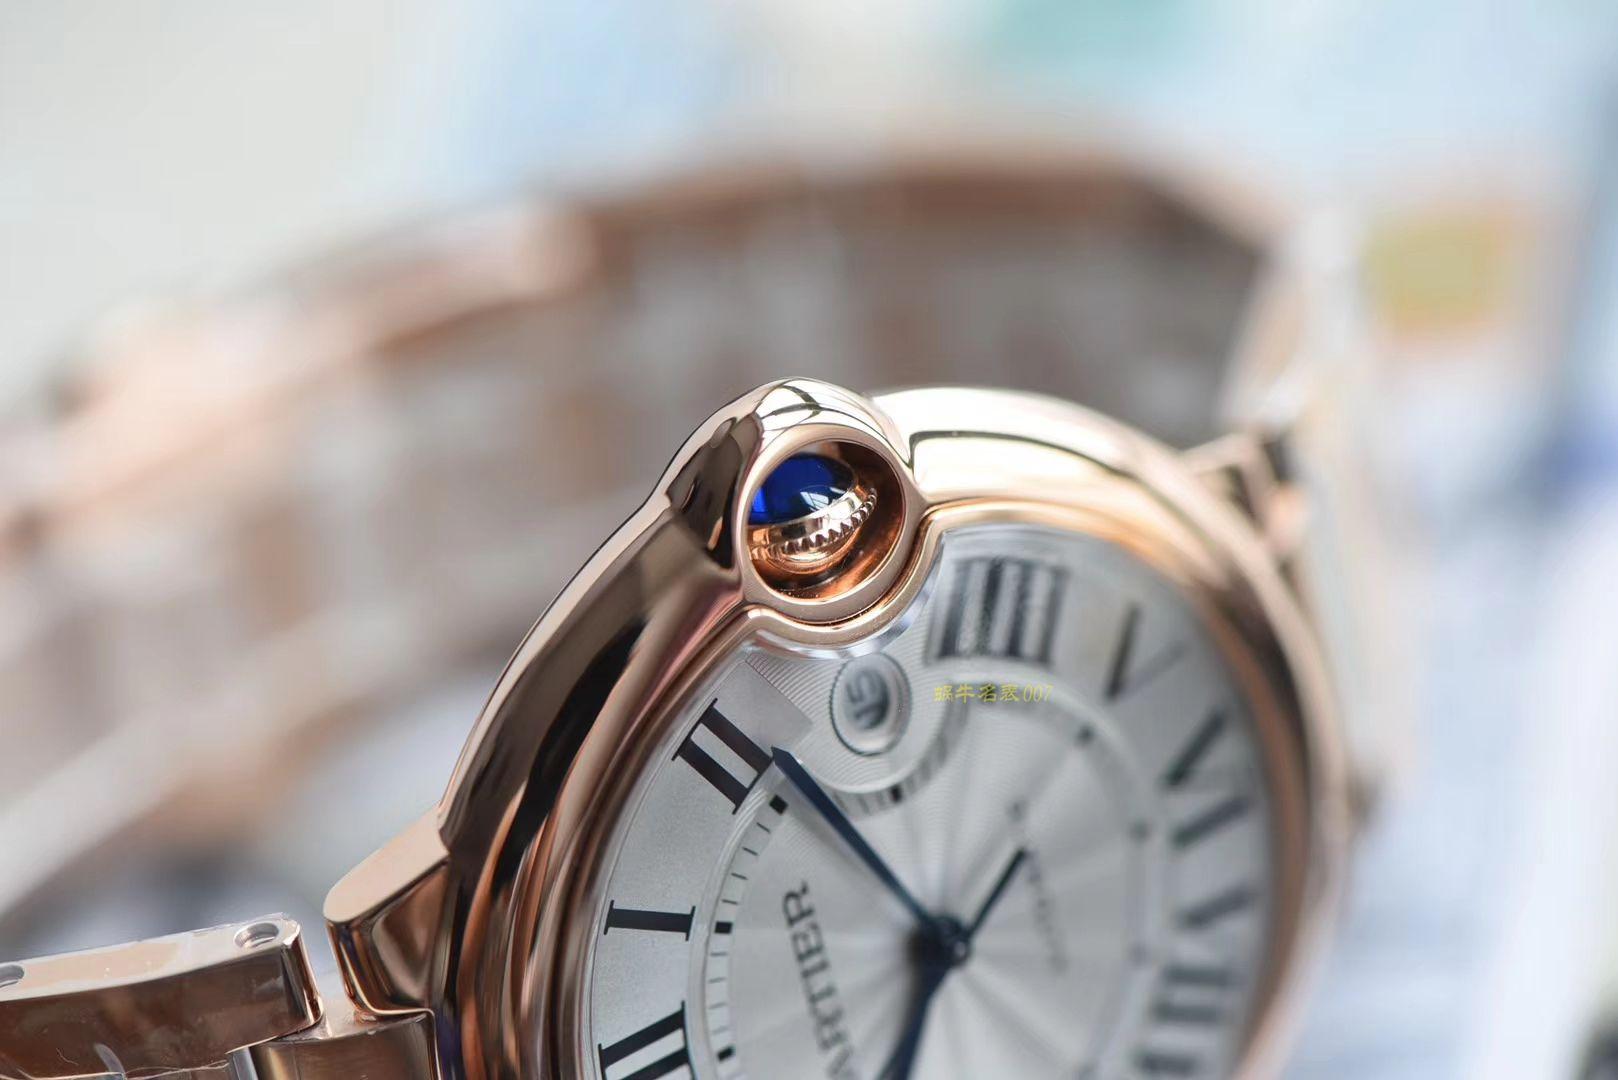 CARTIER卡地亚蓝气球系列W69006Z2腕表【一比一超A高仿手表】V6厂顶级蓝气球全玫瑰金款❗